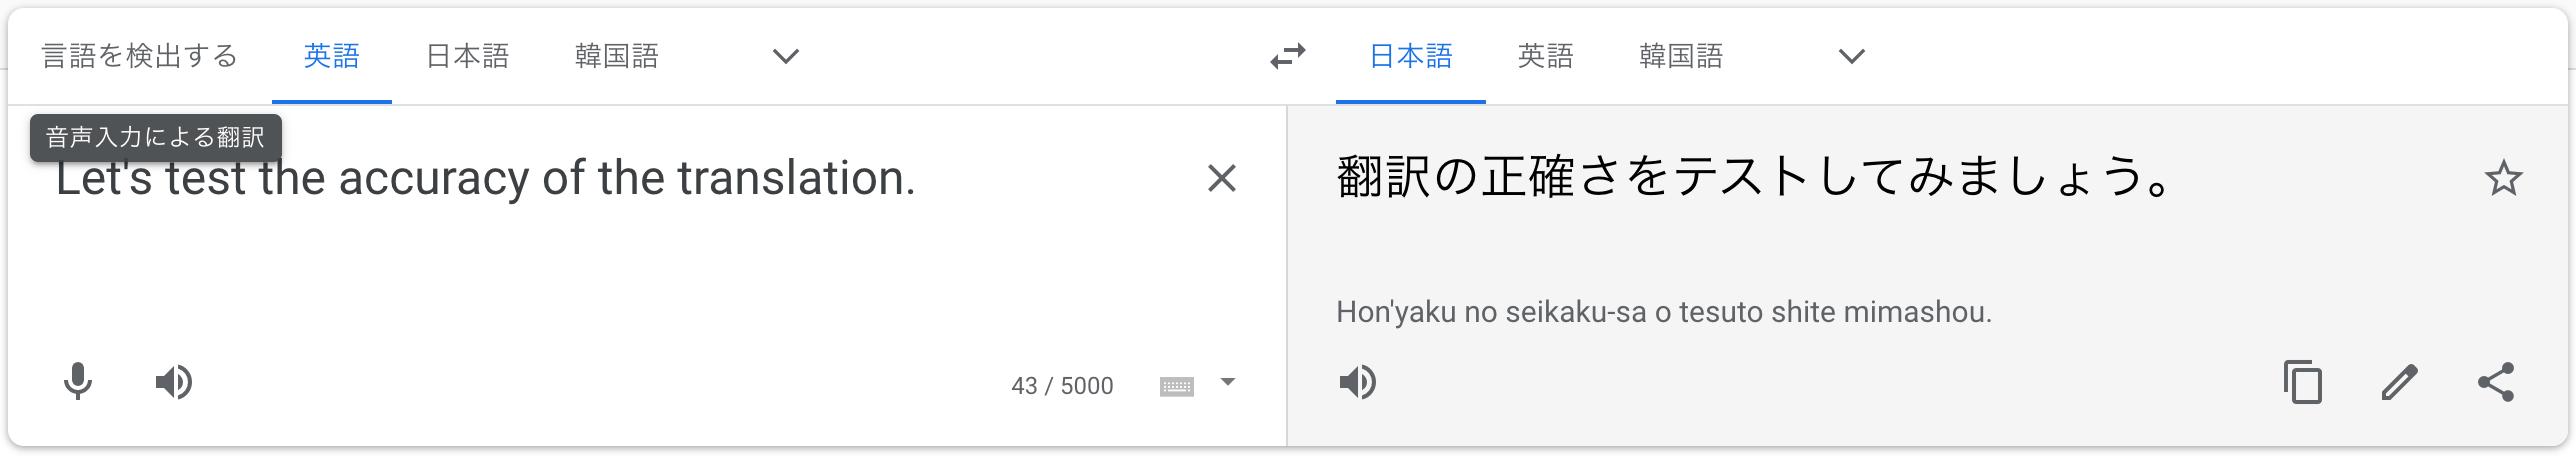 Google翻訳画面